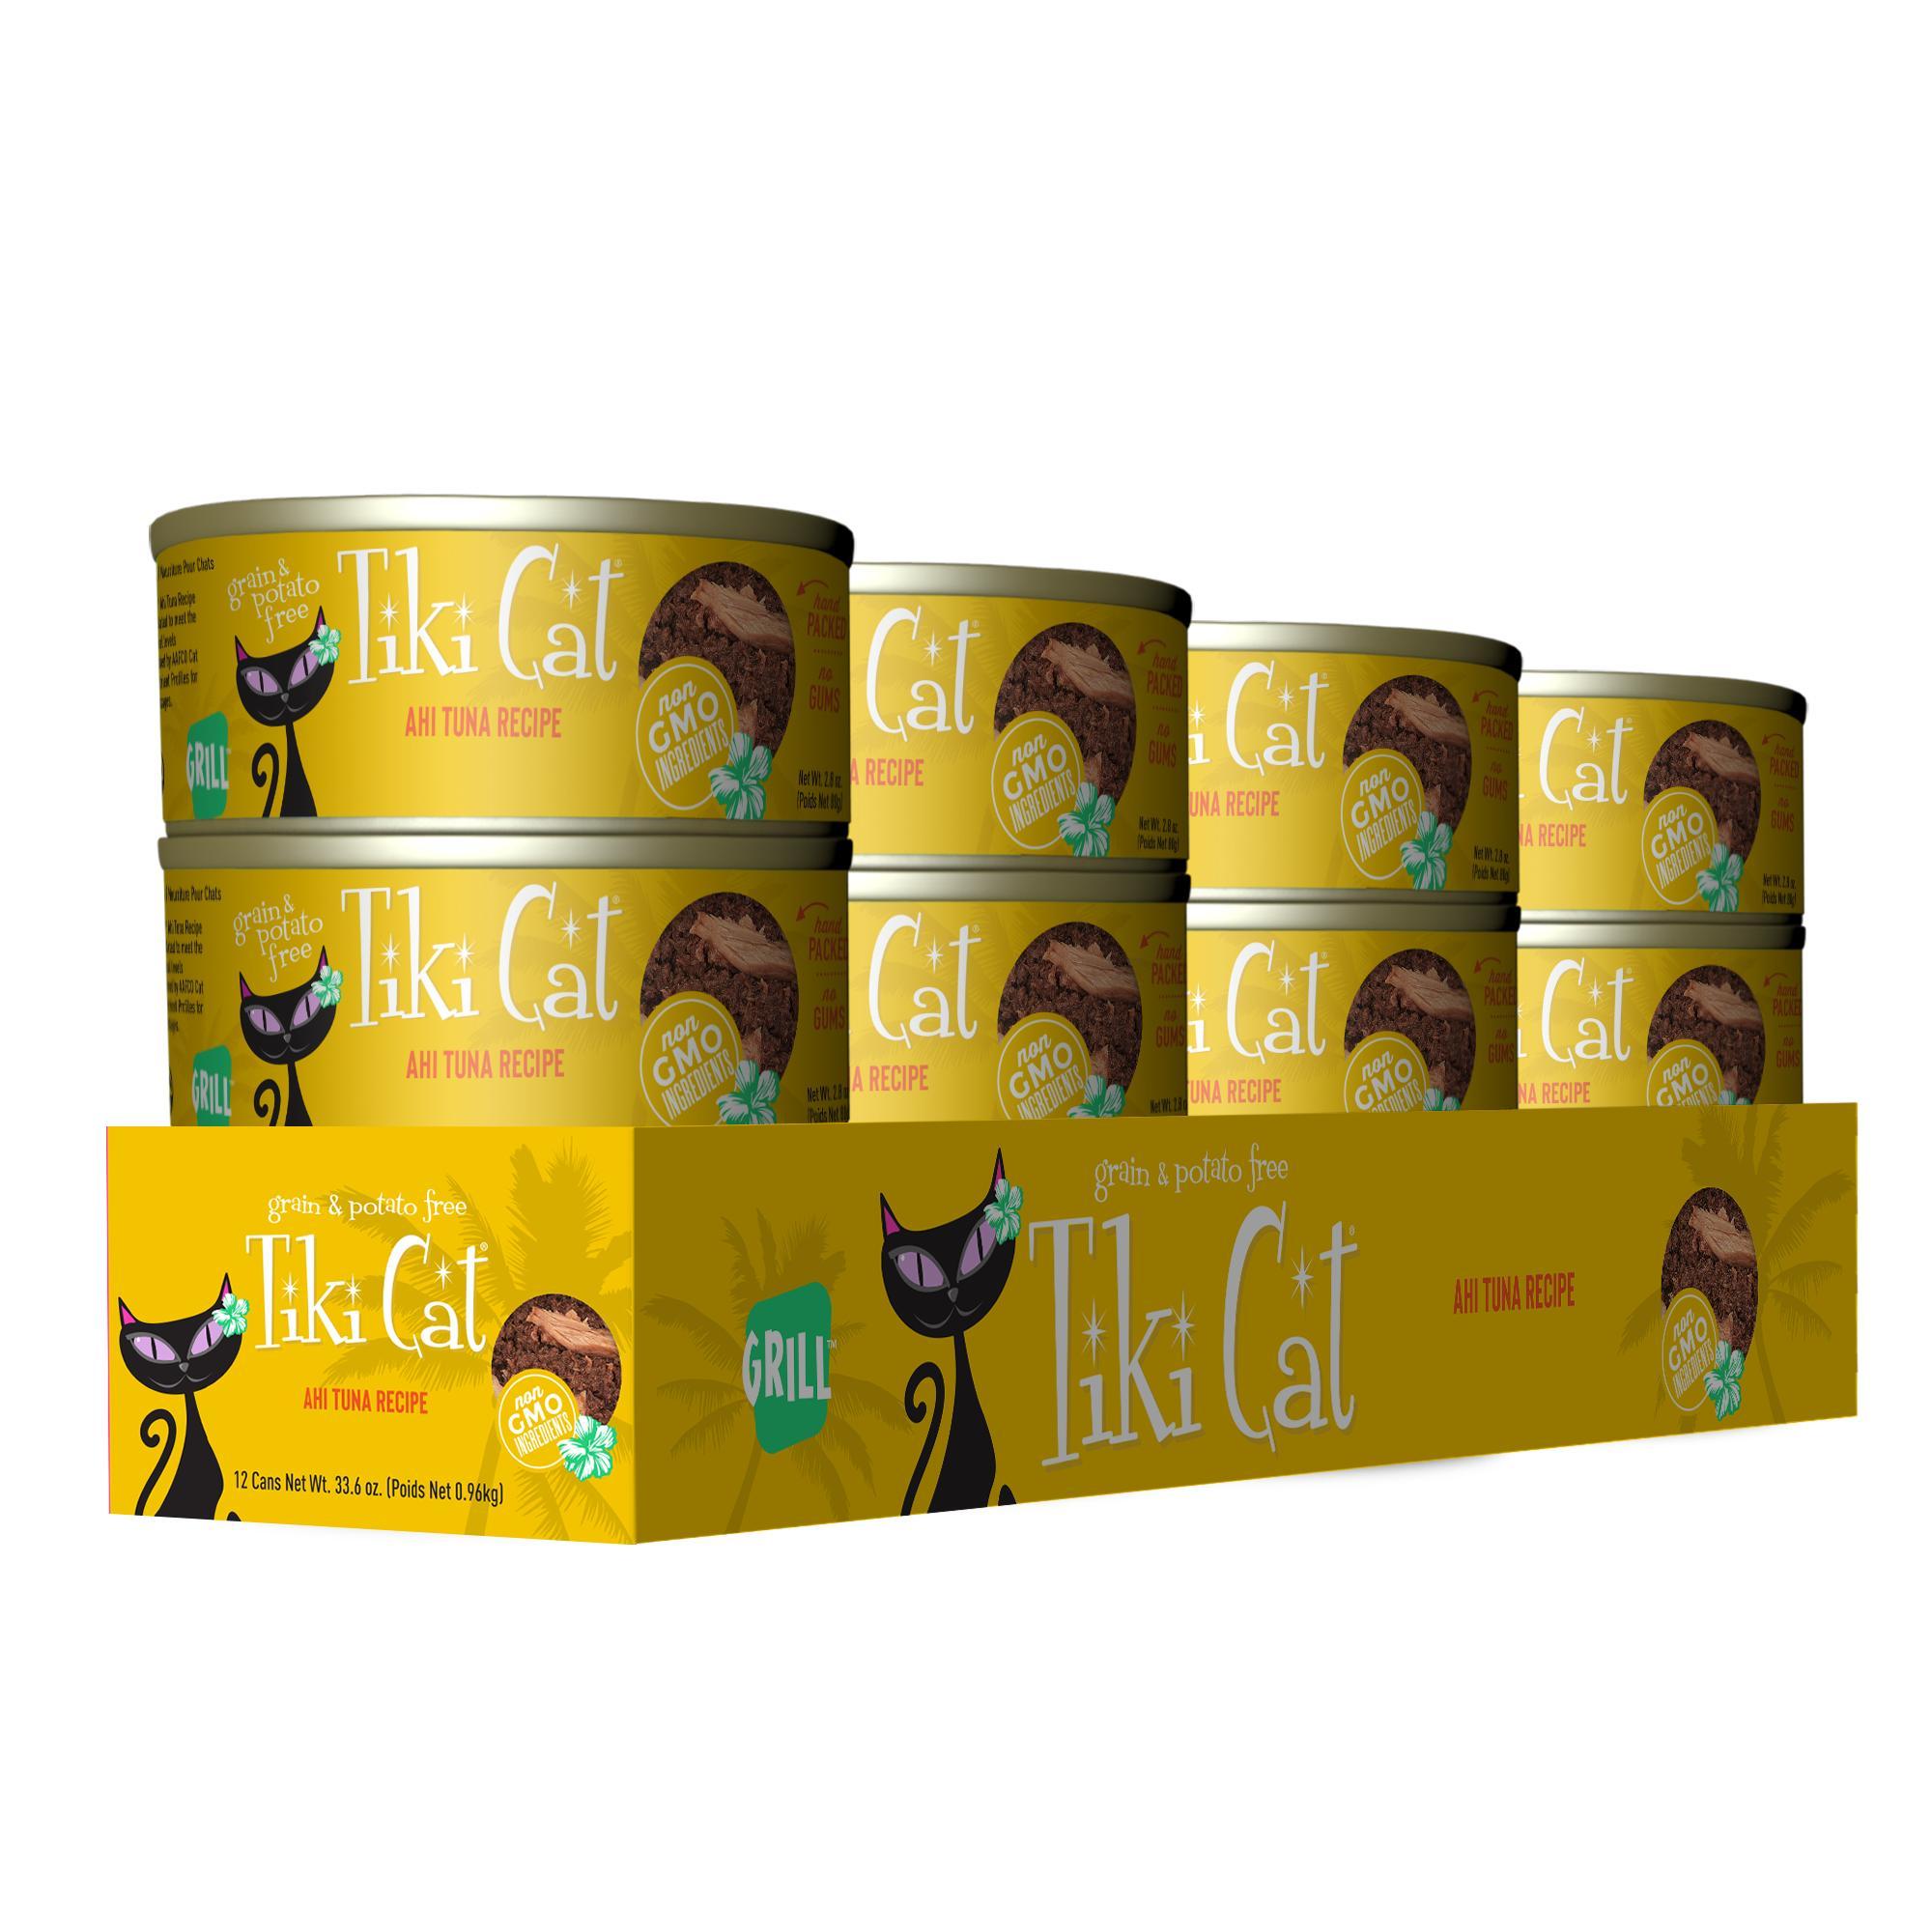 Tiki Cat Grill Hawaiian Ahi Tuna Canned Cat Food, 2.8-oz, case of 12